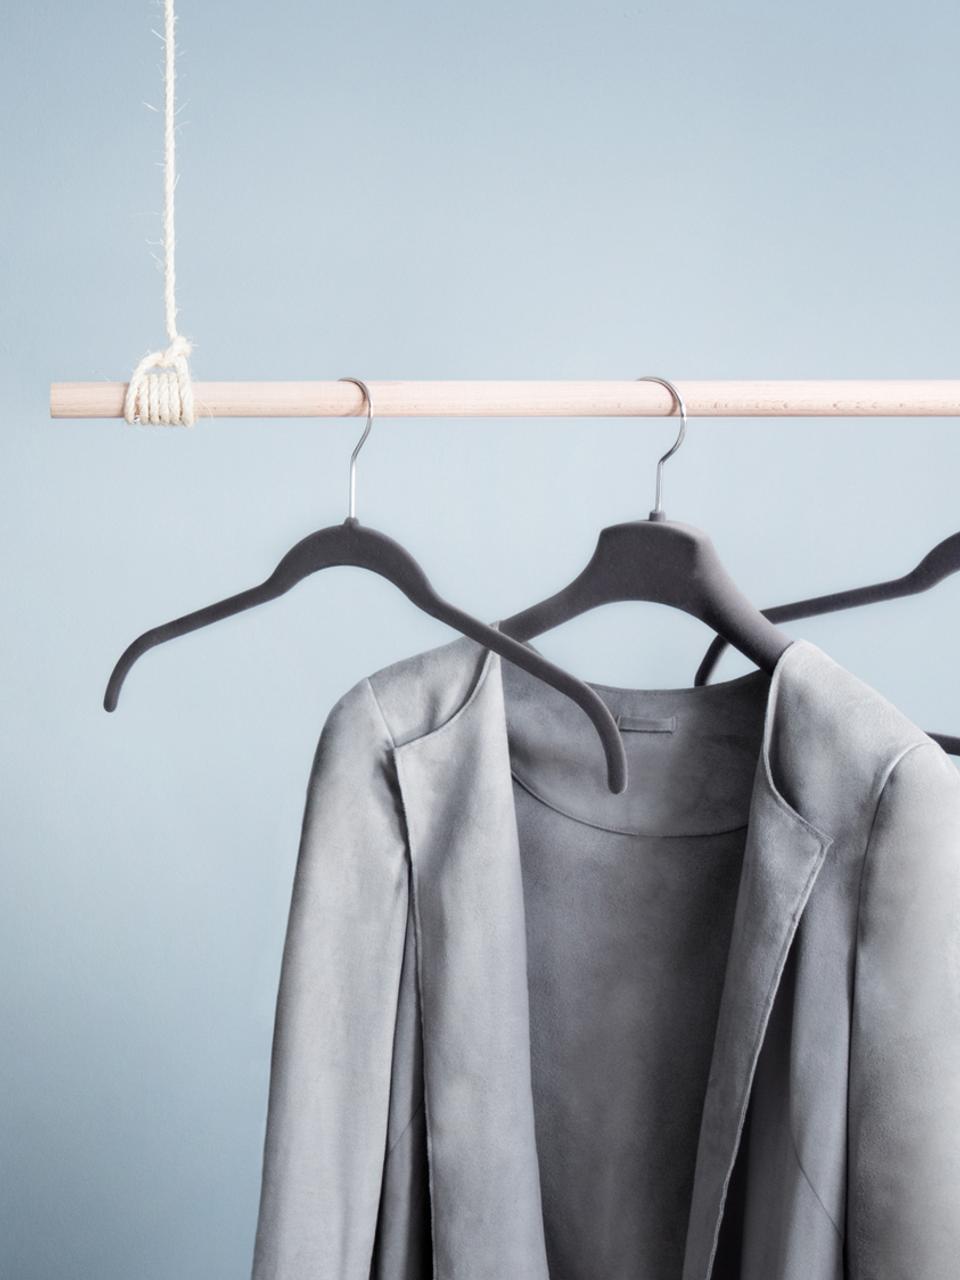 Kleiderbügel Grey Velvet, 12 Stück, Haken: Metall, Bezug: Nylonbeflockung, Grau, 42 x 25 cm